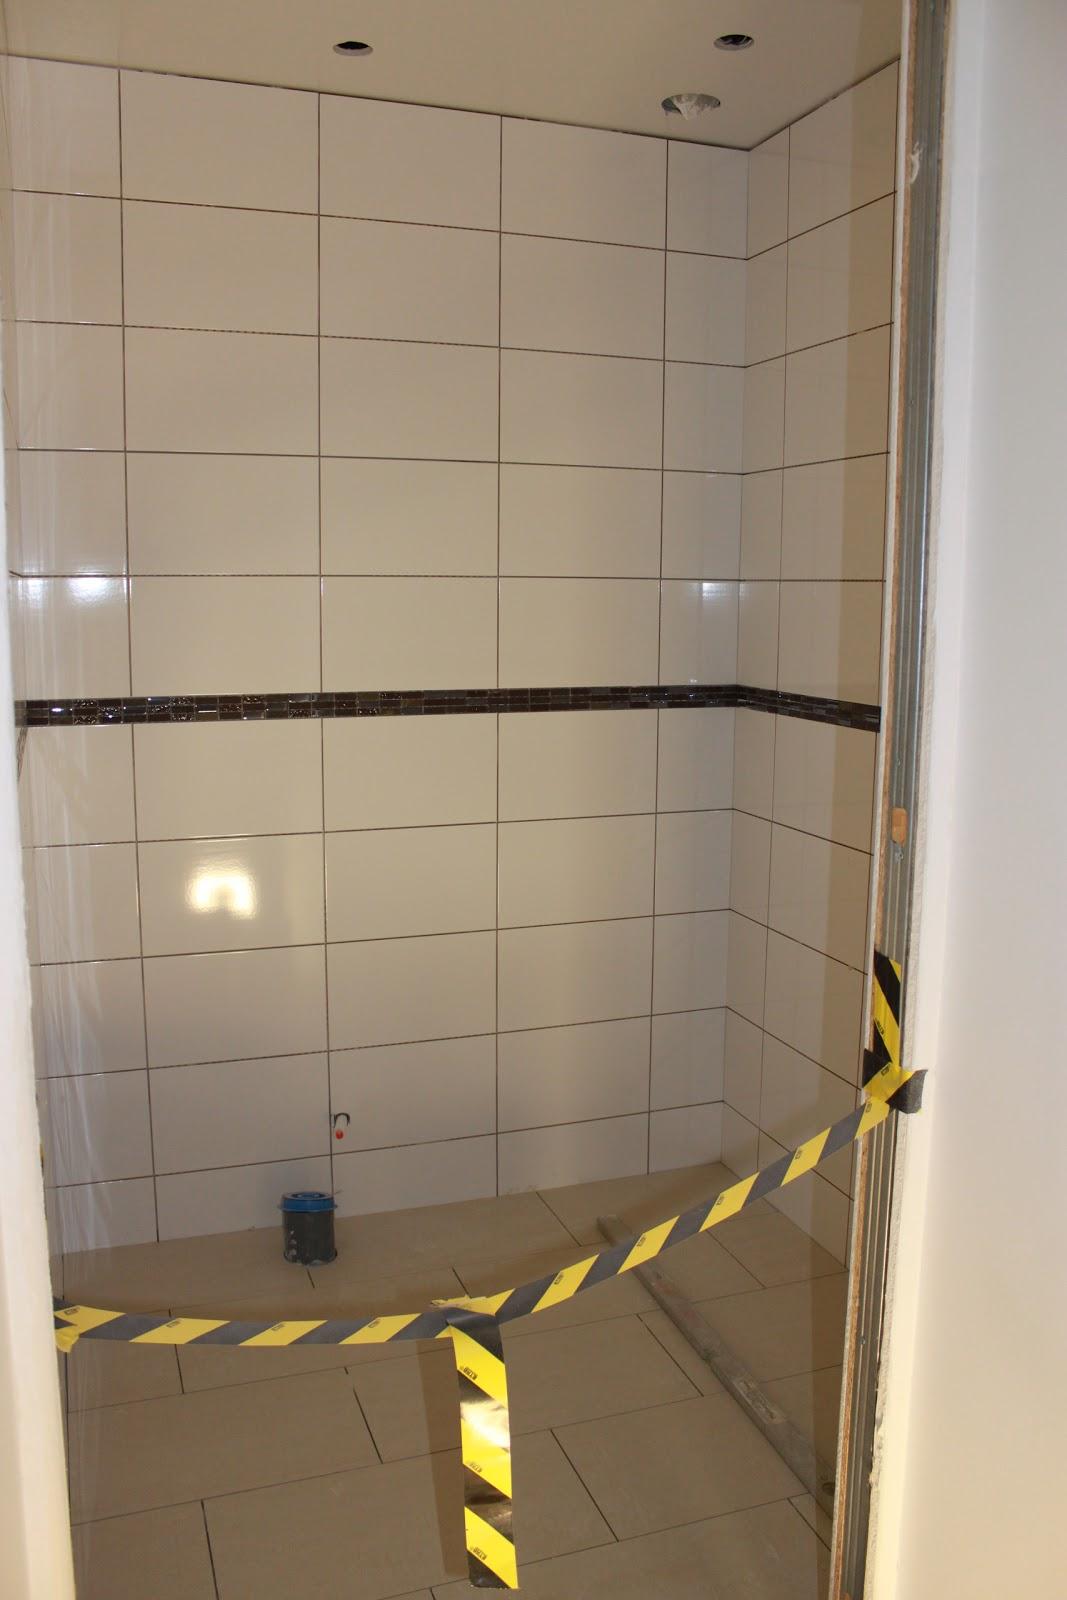 Am dreamhouse: badrum börjar ta form